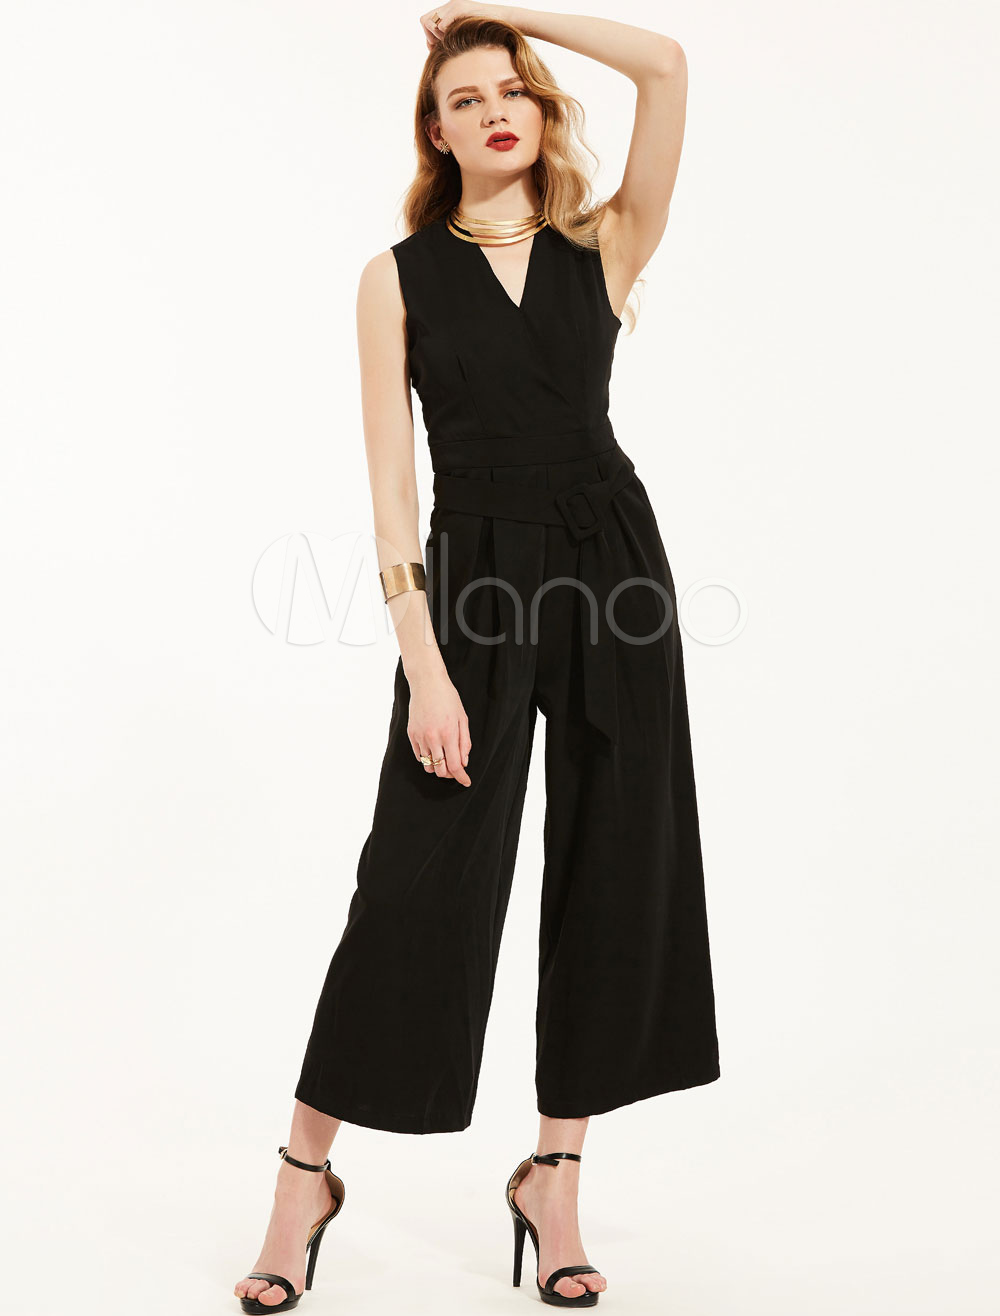 Black Summer Jumpsuit V Neck Sleeveless Chiffon Cropped Loose Leg Women's Long Jumpsuit